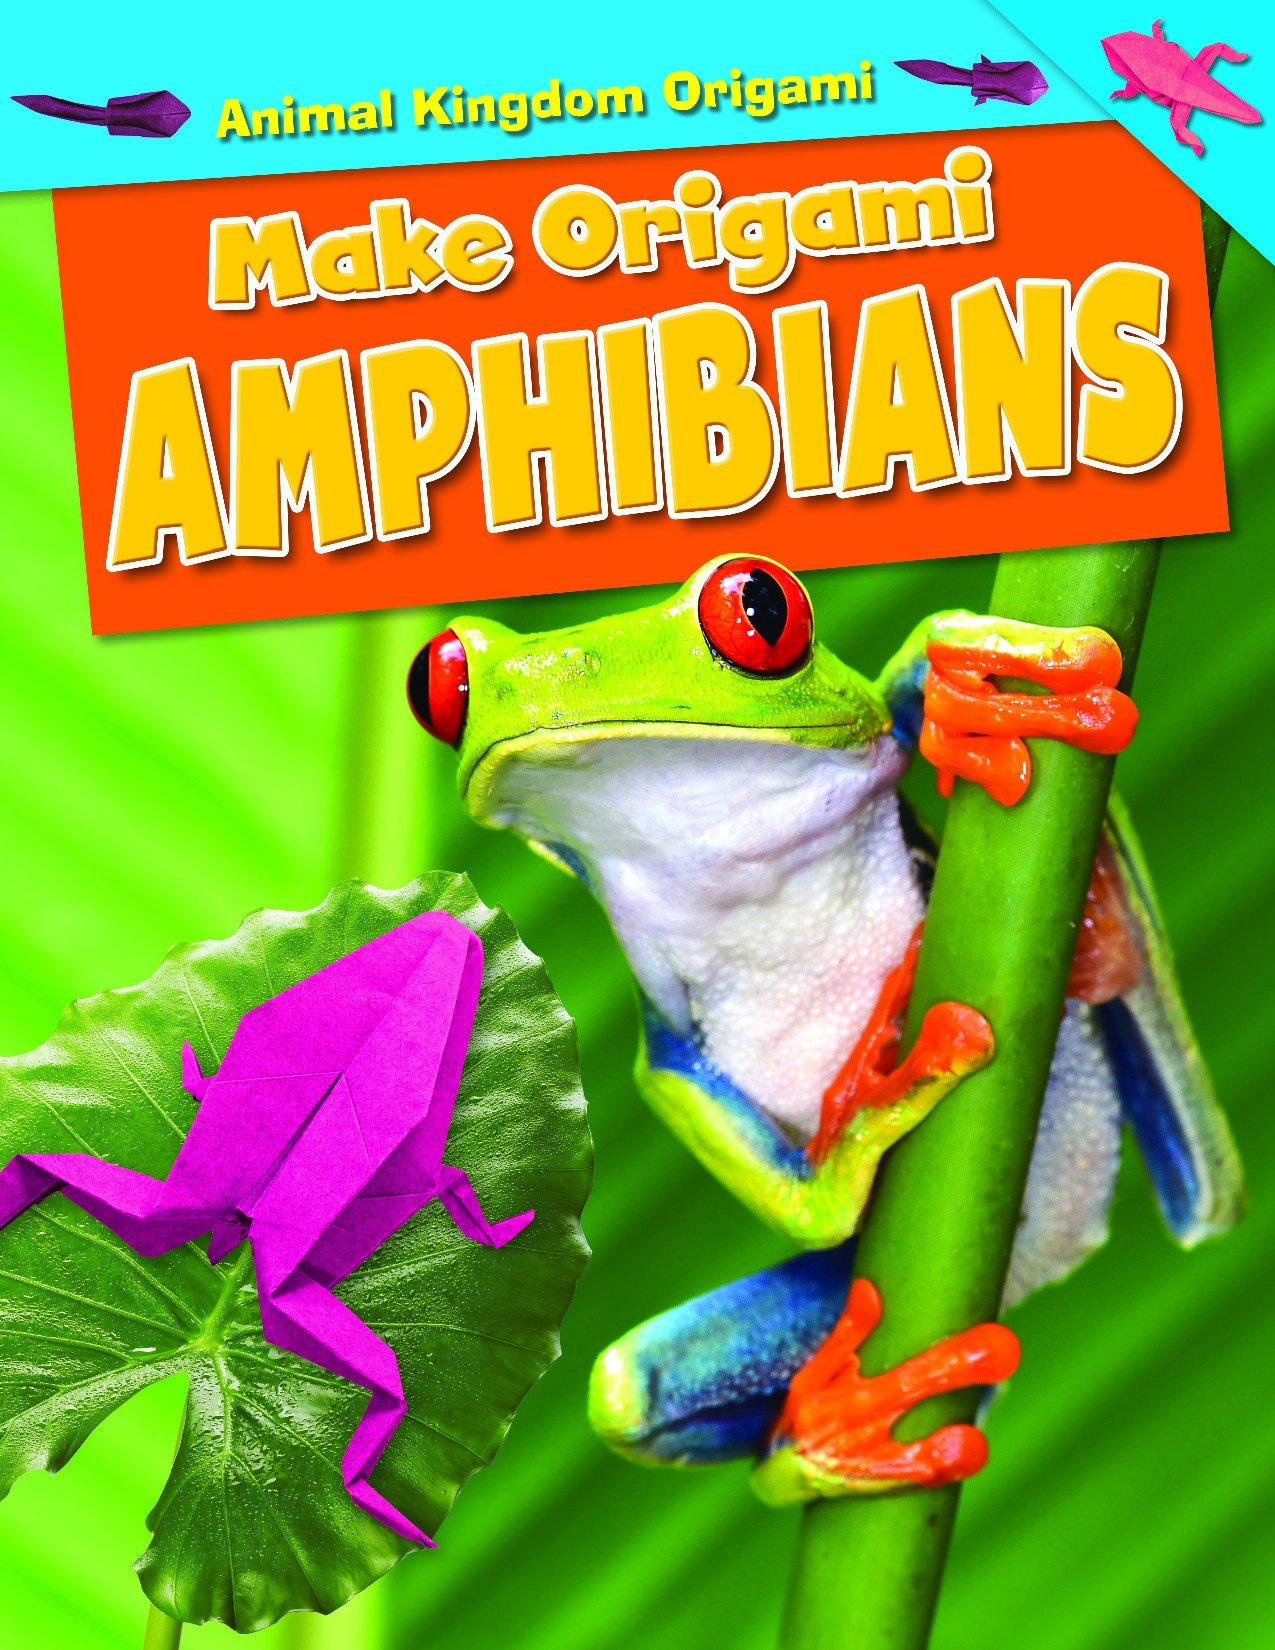 Make Origami Amphibians (Animal Kingdom Origami) PDF